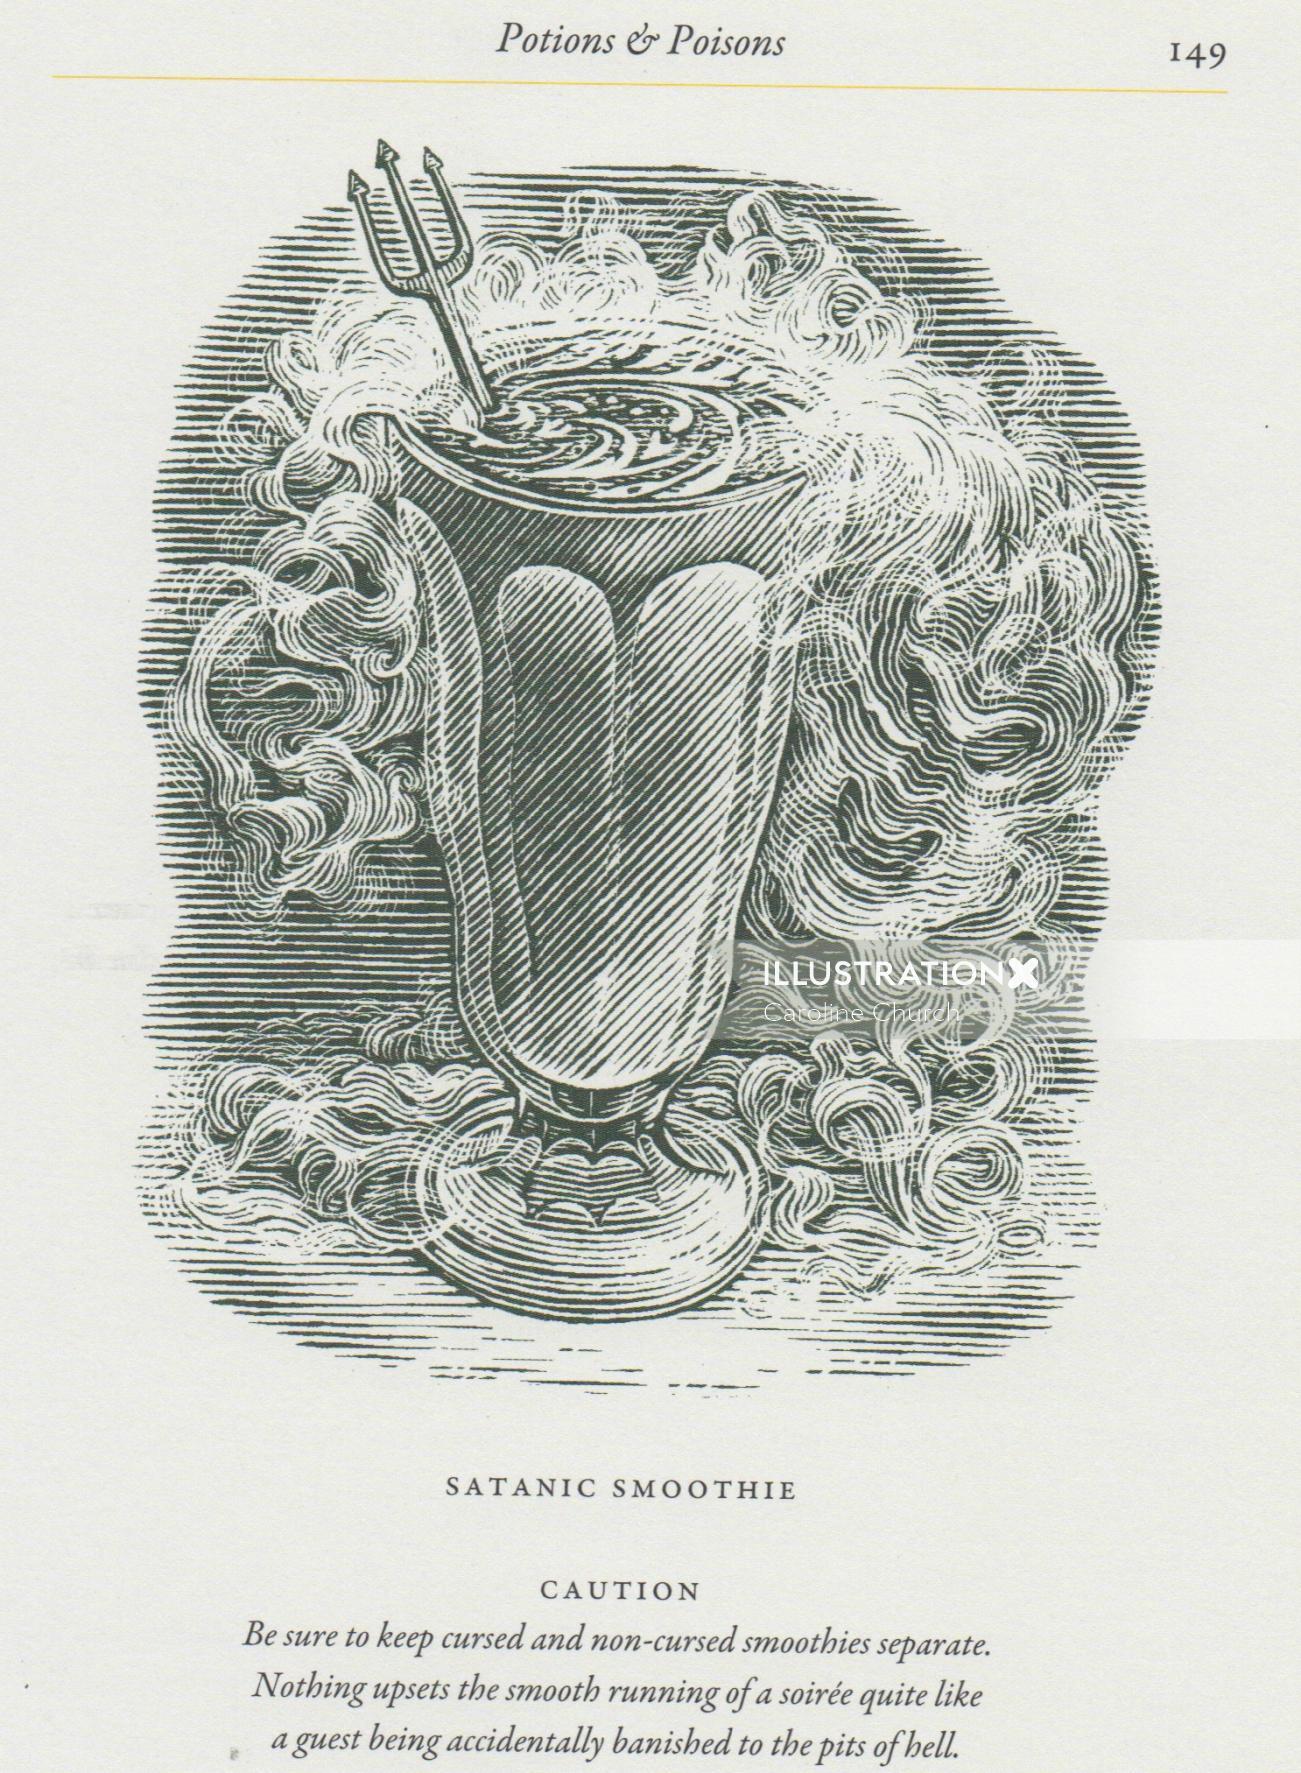 Food & Drink Satanic smoothie